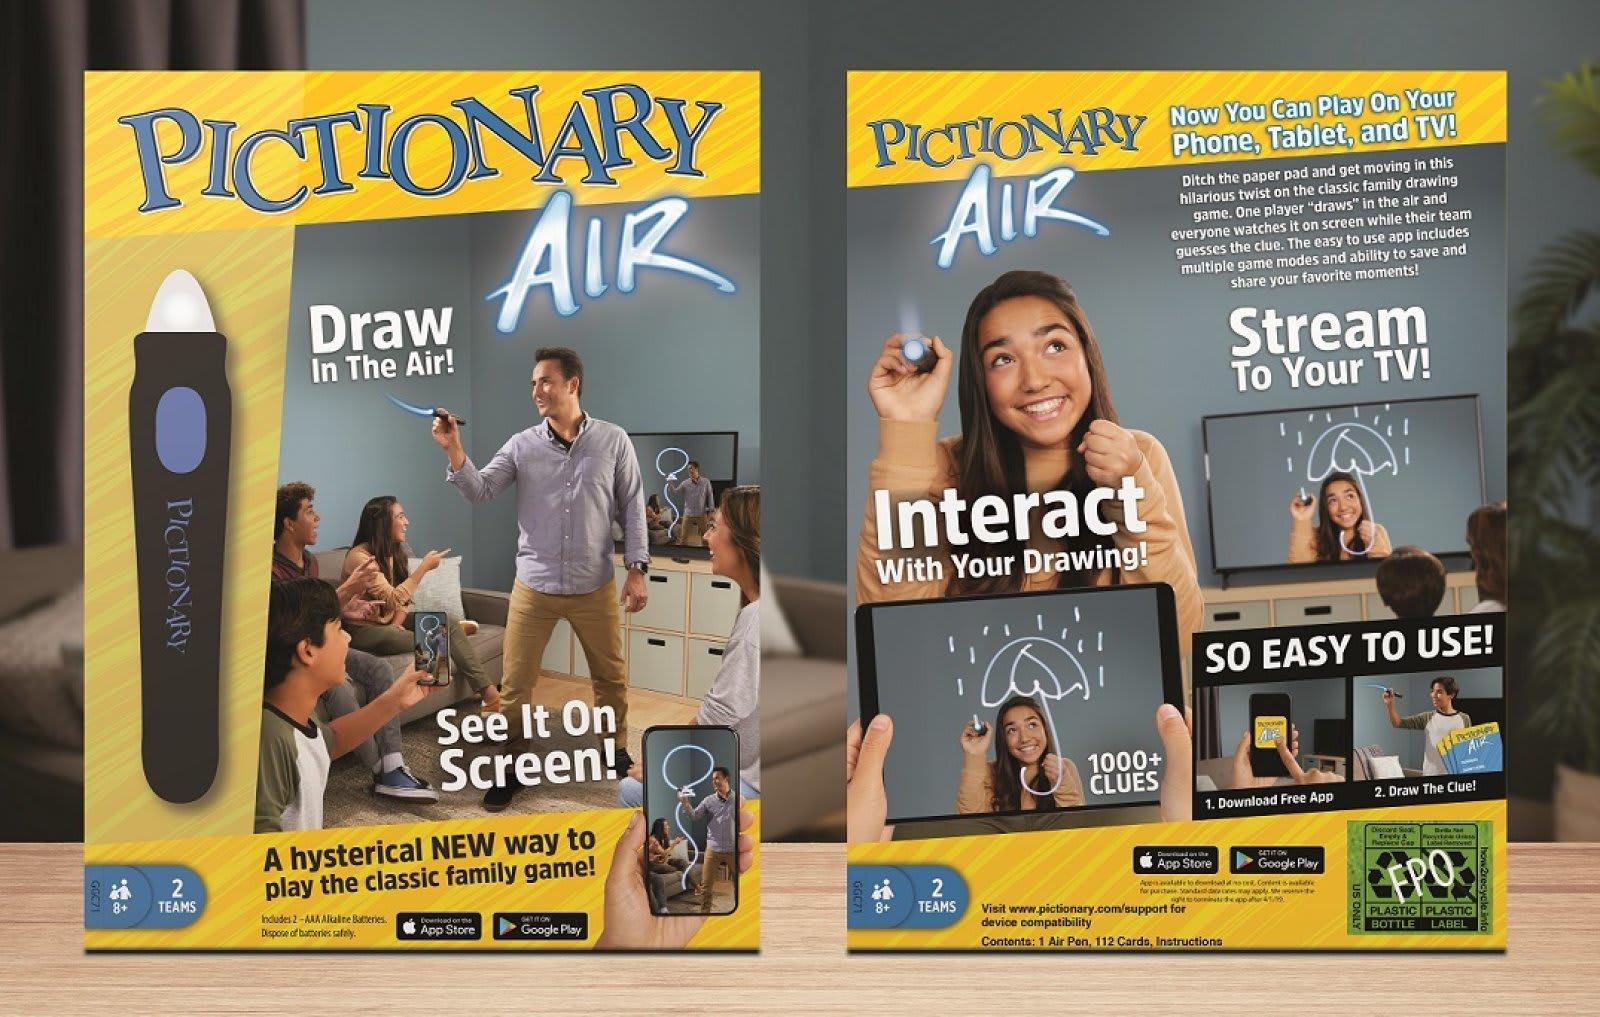 Next-gen 'Pictionary Air' arrives at Target June 23rd